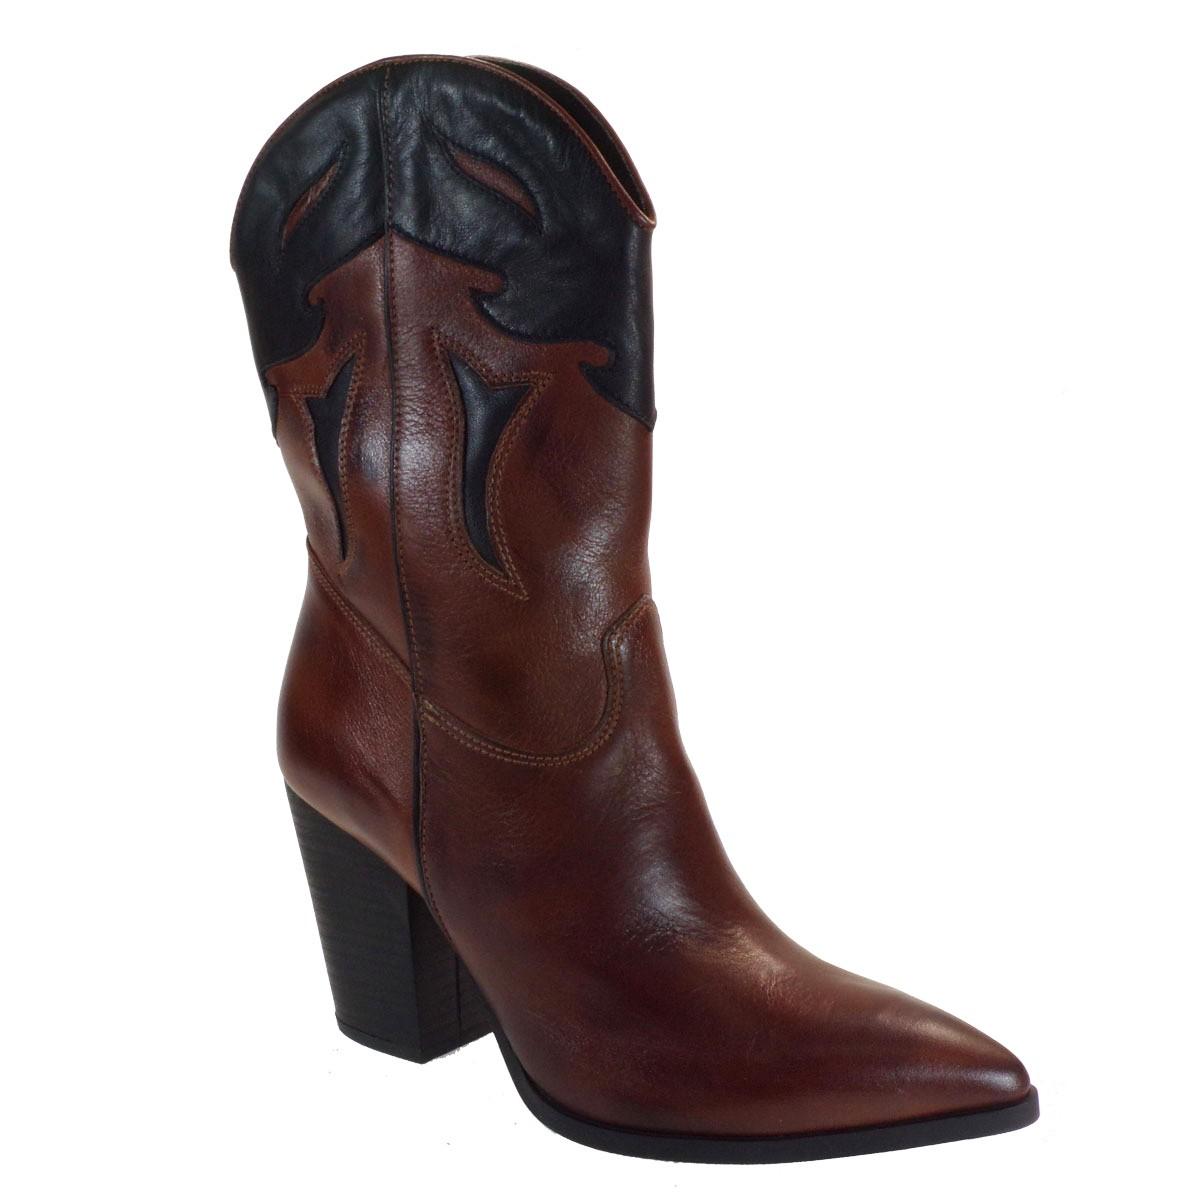 fardoulis shoes gynaikies mpotes cow boy dermatines tampa k351 www.bagiotashoes.gr